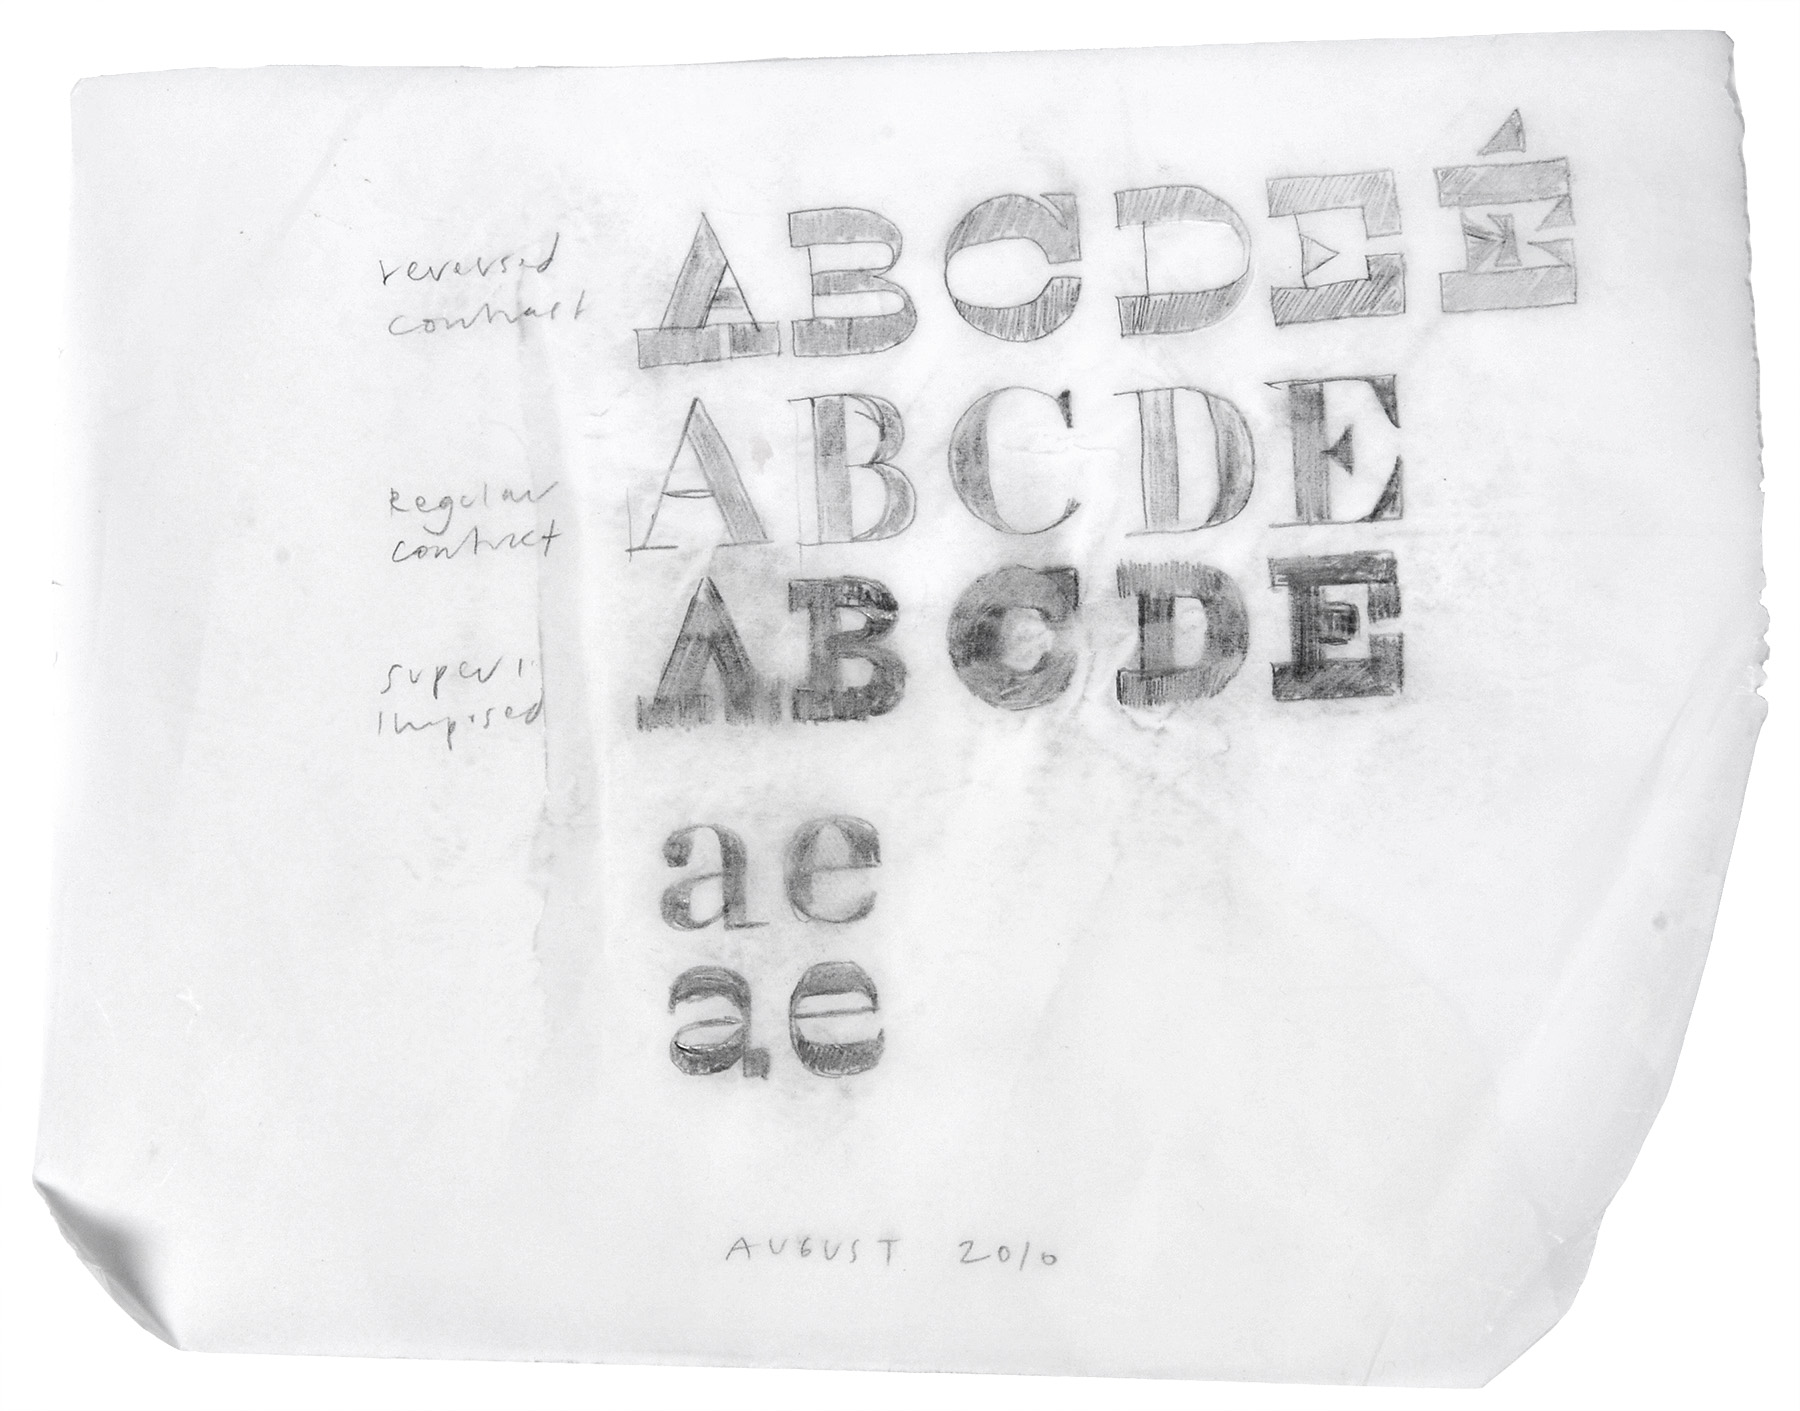 Karloff sketch, Peter Bi'lak, Typotheque, 2012